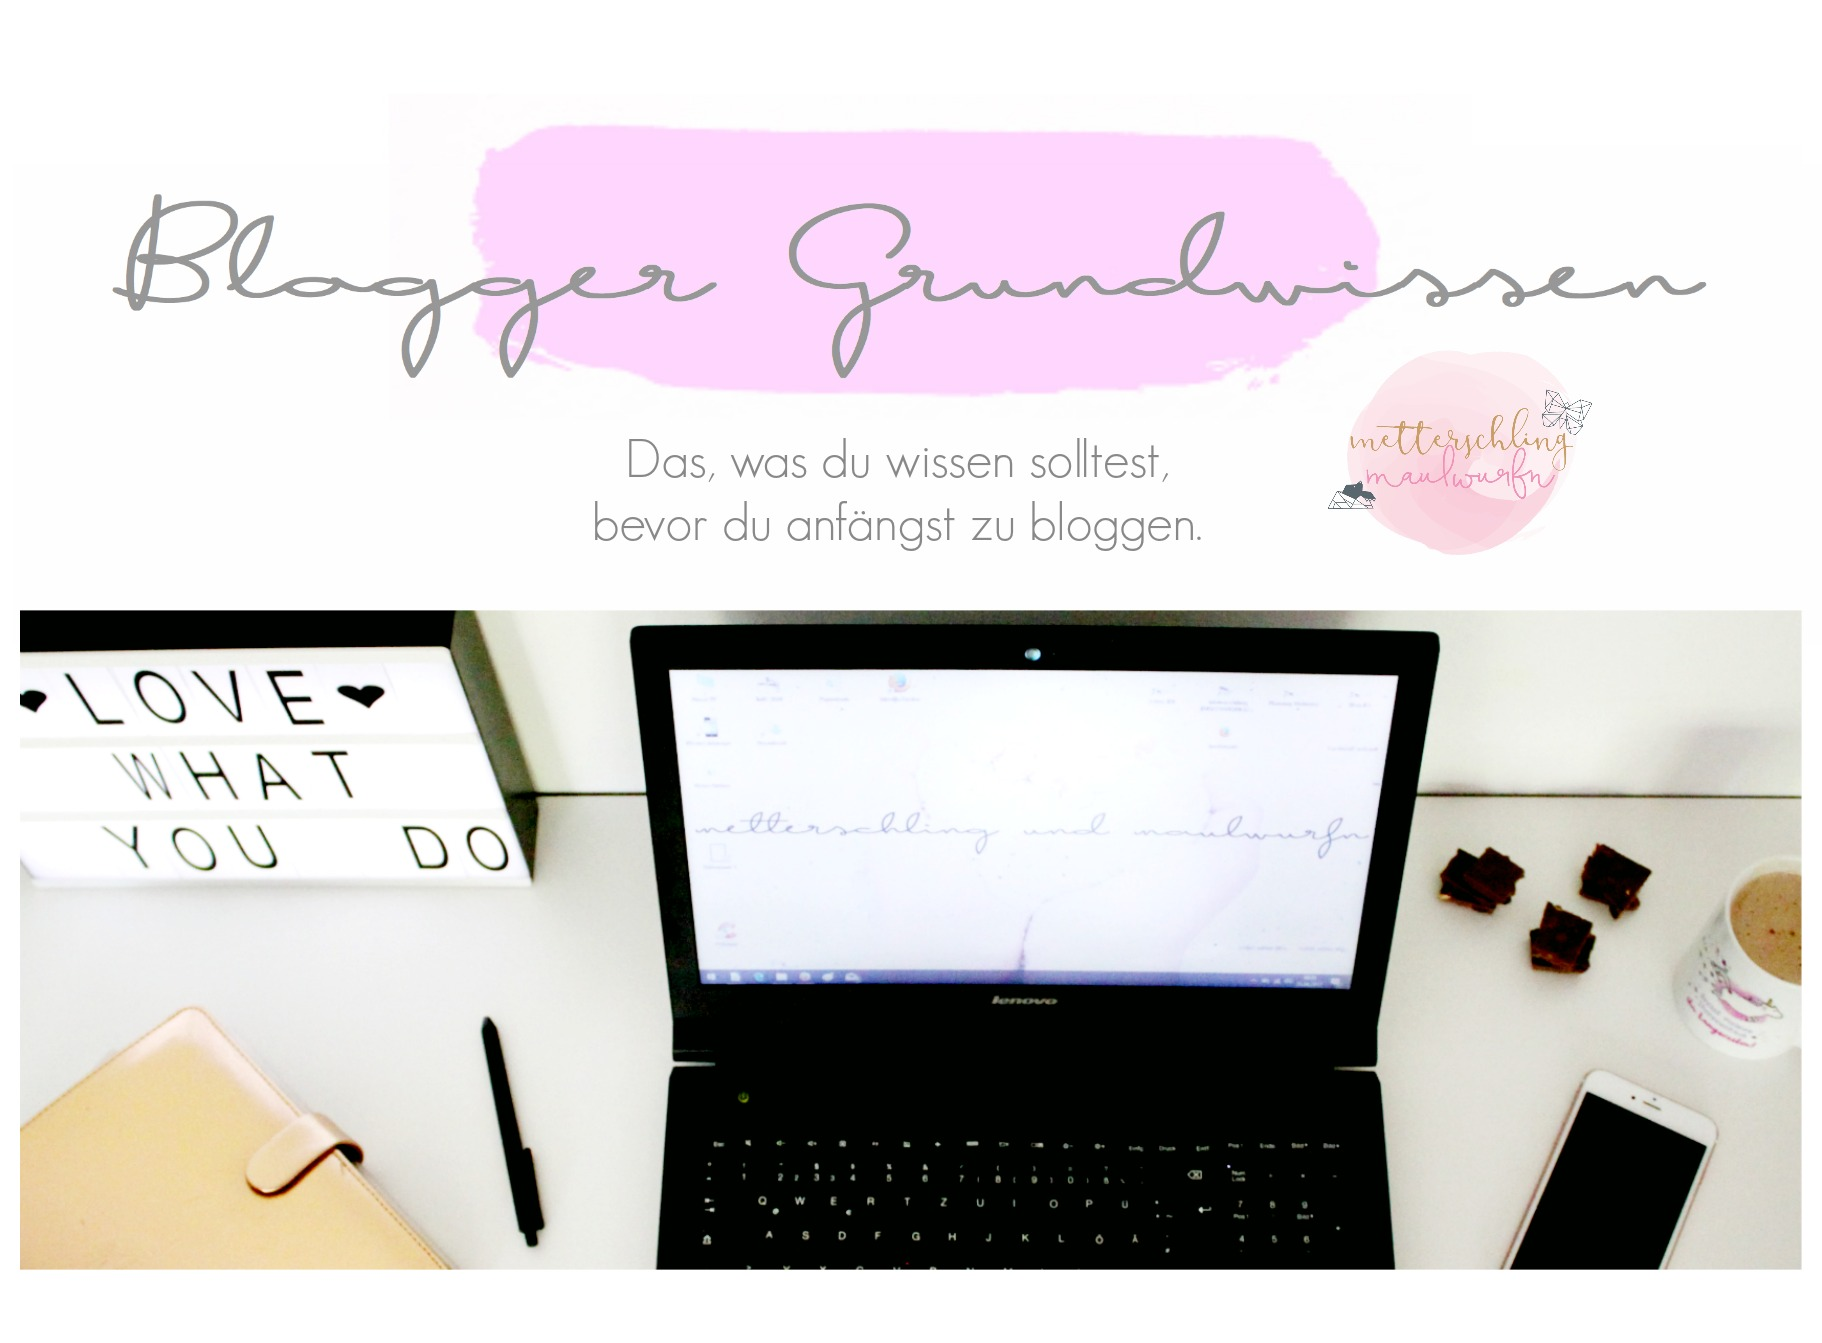 blogger grundwissen was wo wie tipps anleitung